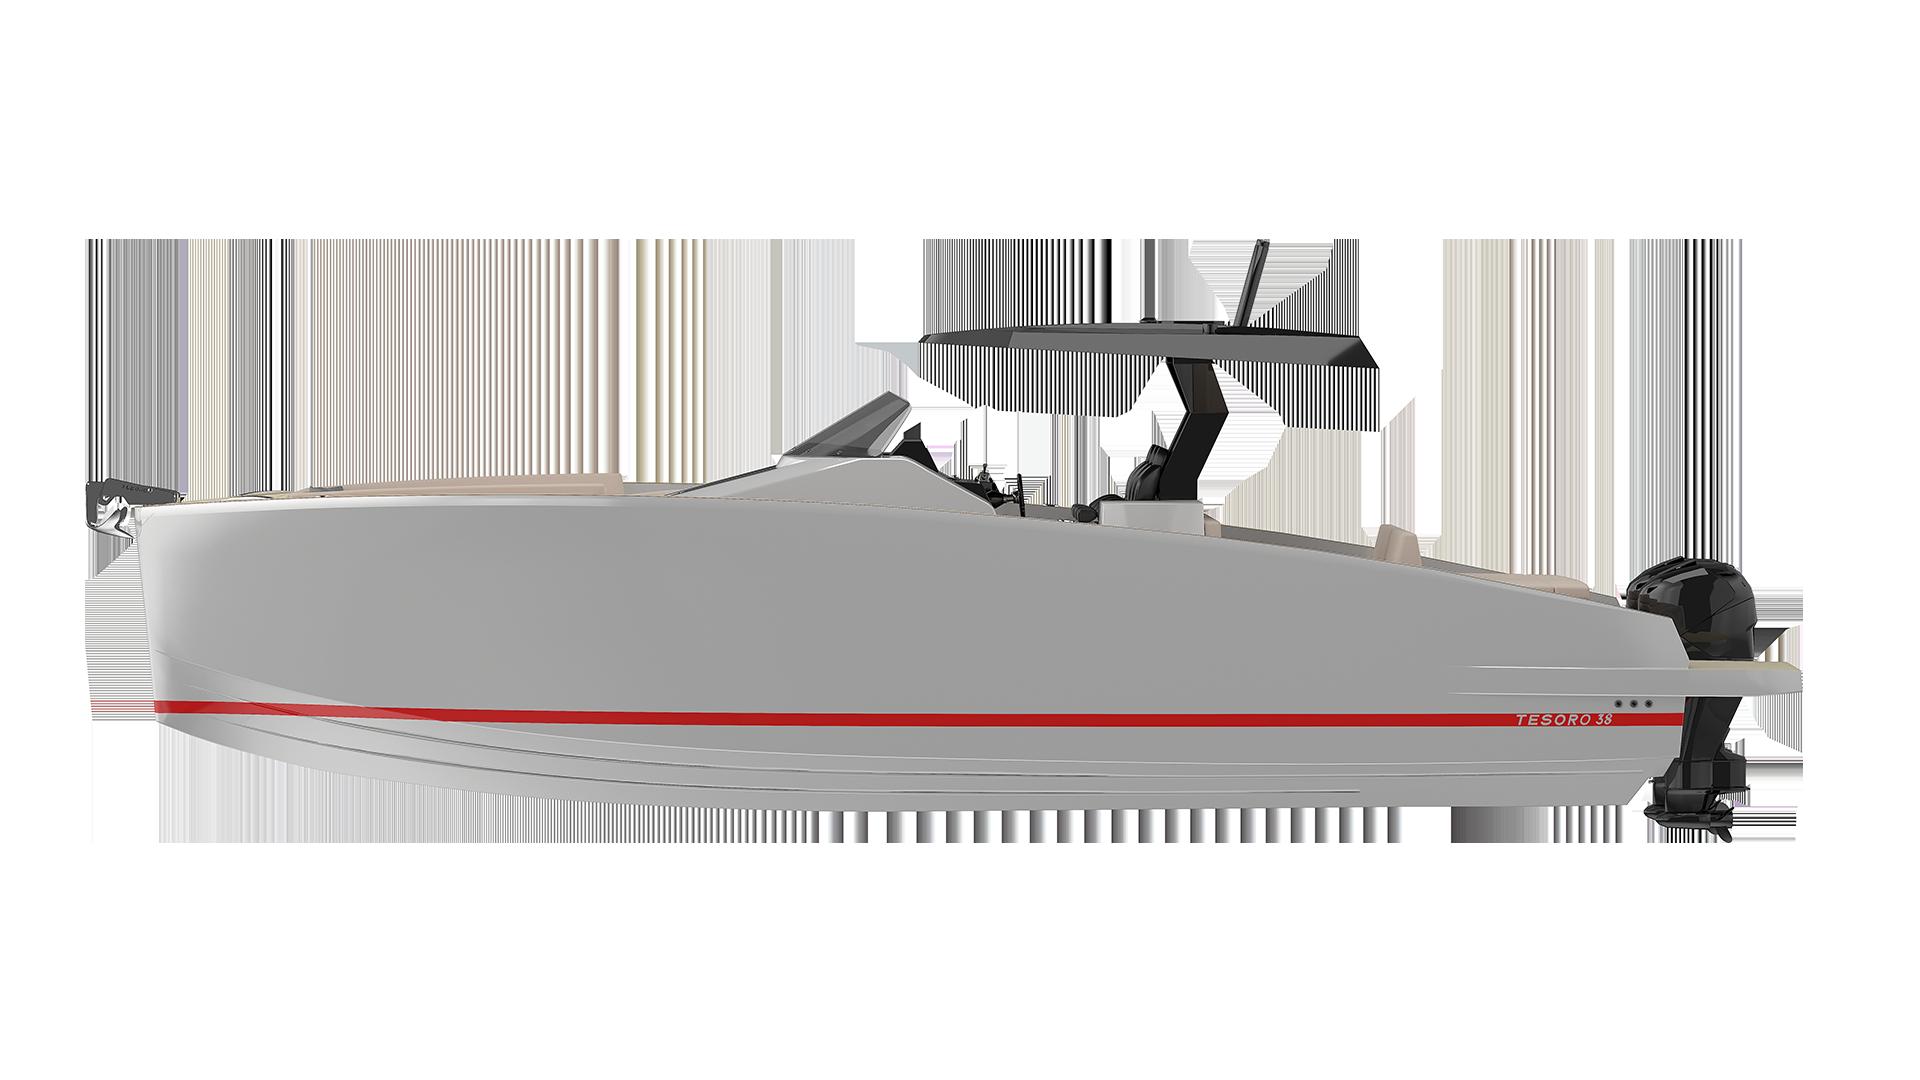 T38 Cruiser 5